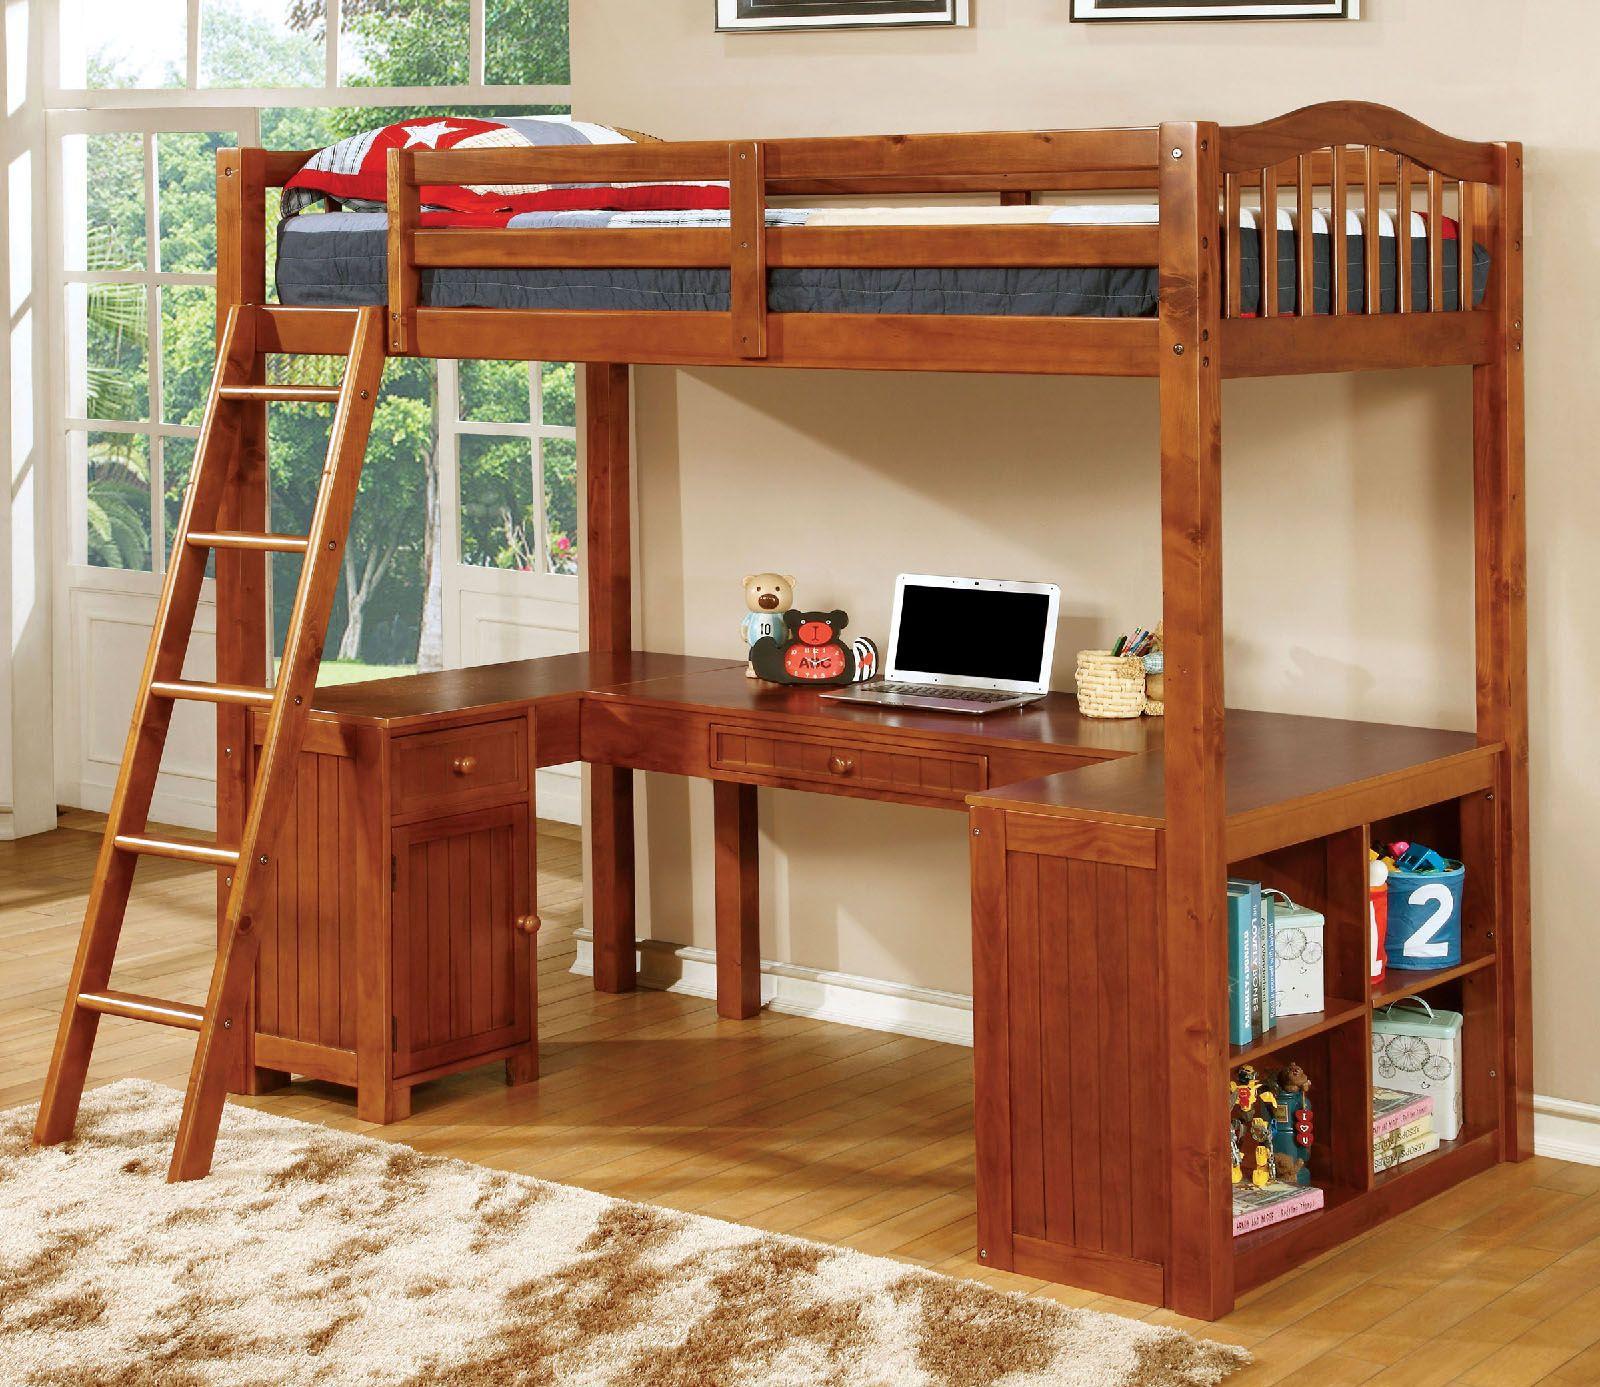 Loft bed ideas kids  Kiddie World u Kids Furniture Super Store Largest selection of bunk